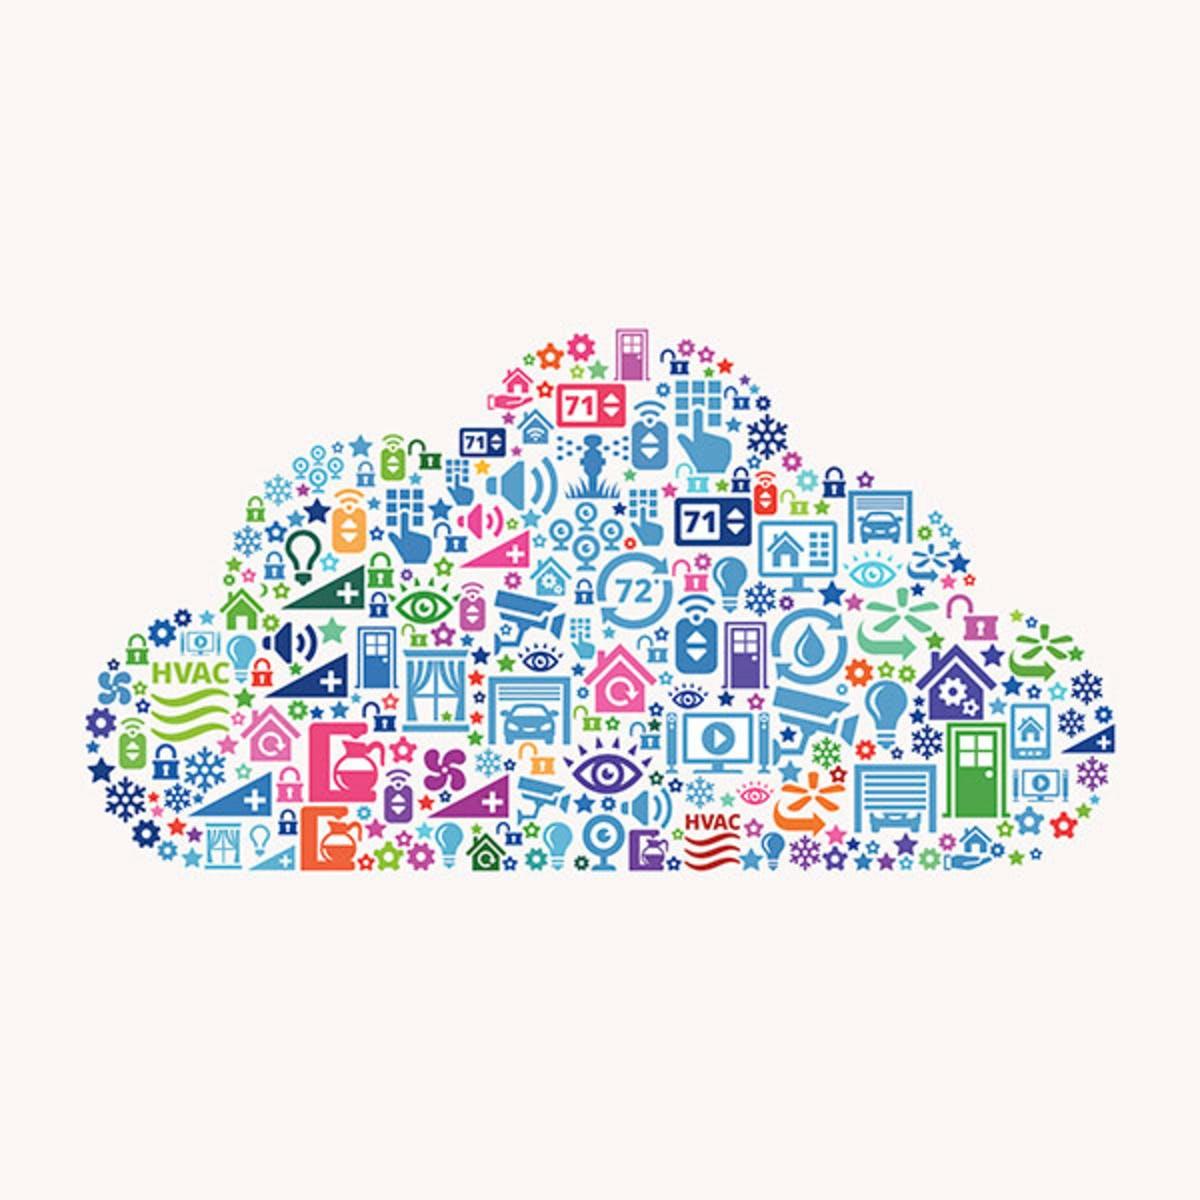 Internet of Things: Multimedia Technologies